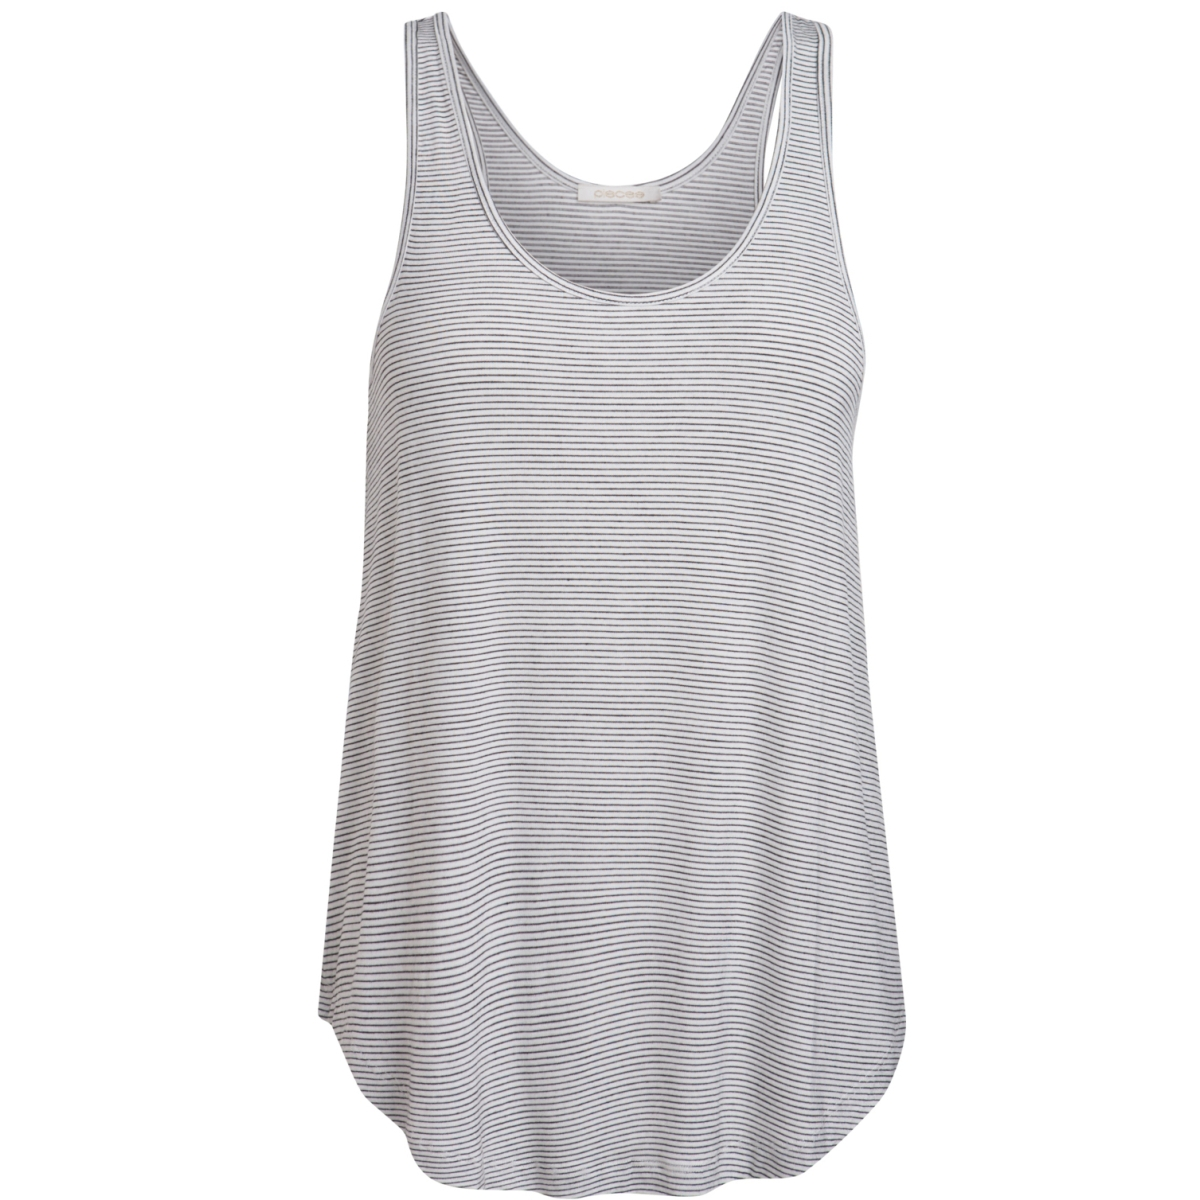 pcbillo tank top noos 17073998 pieces top bright white/ black